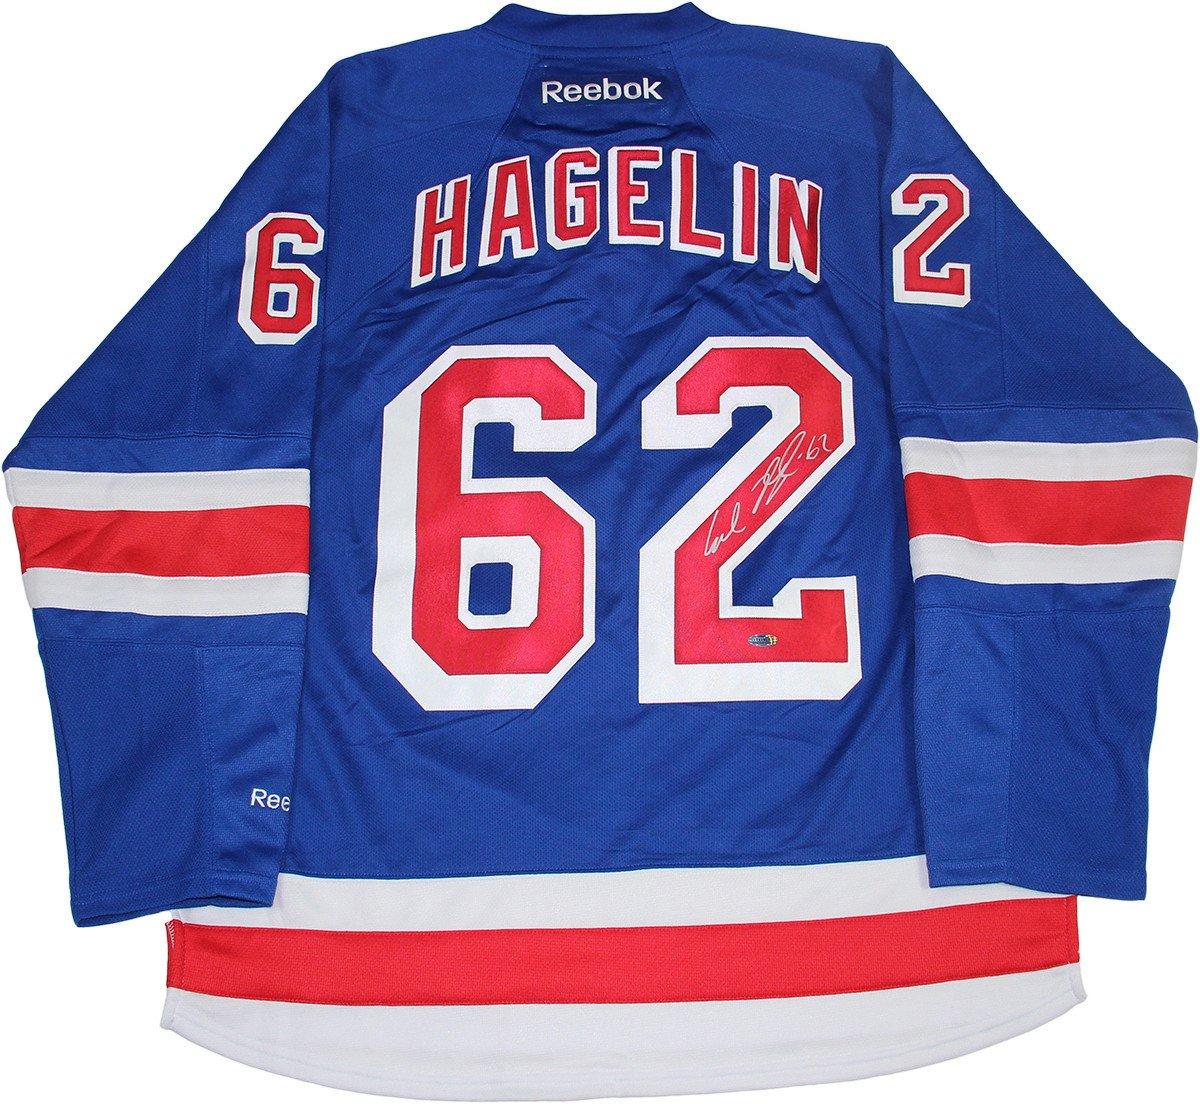 finest selection 6a7e0 8e94f Carl Hagelin Signed New York Rangers Blue Jersey · The World Table Hockey  Association, Inc.